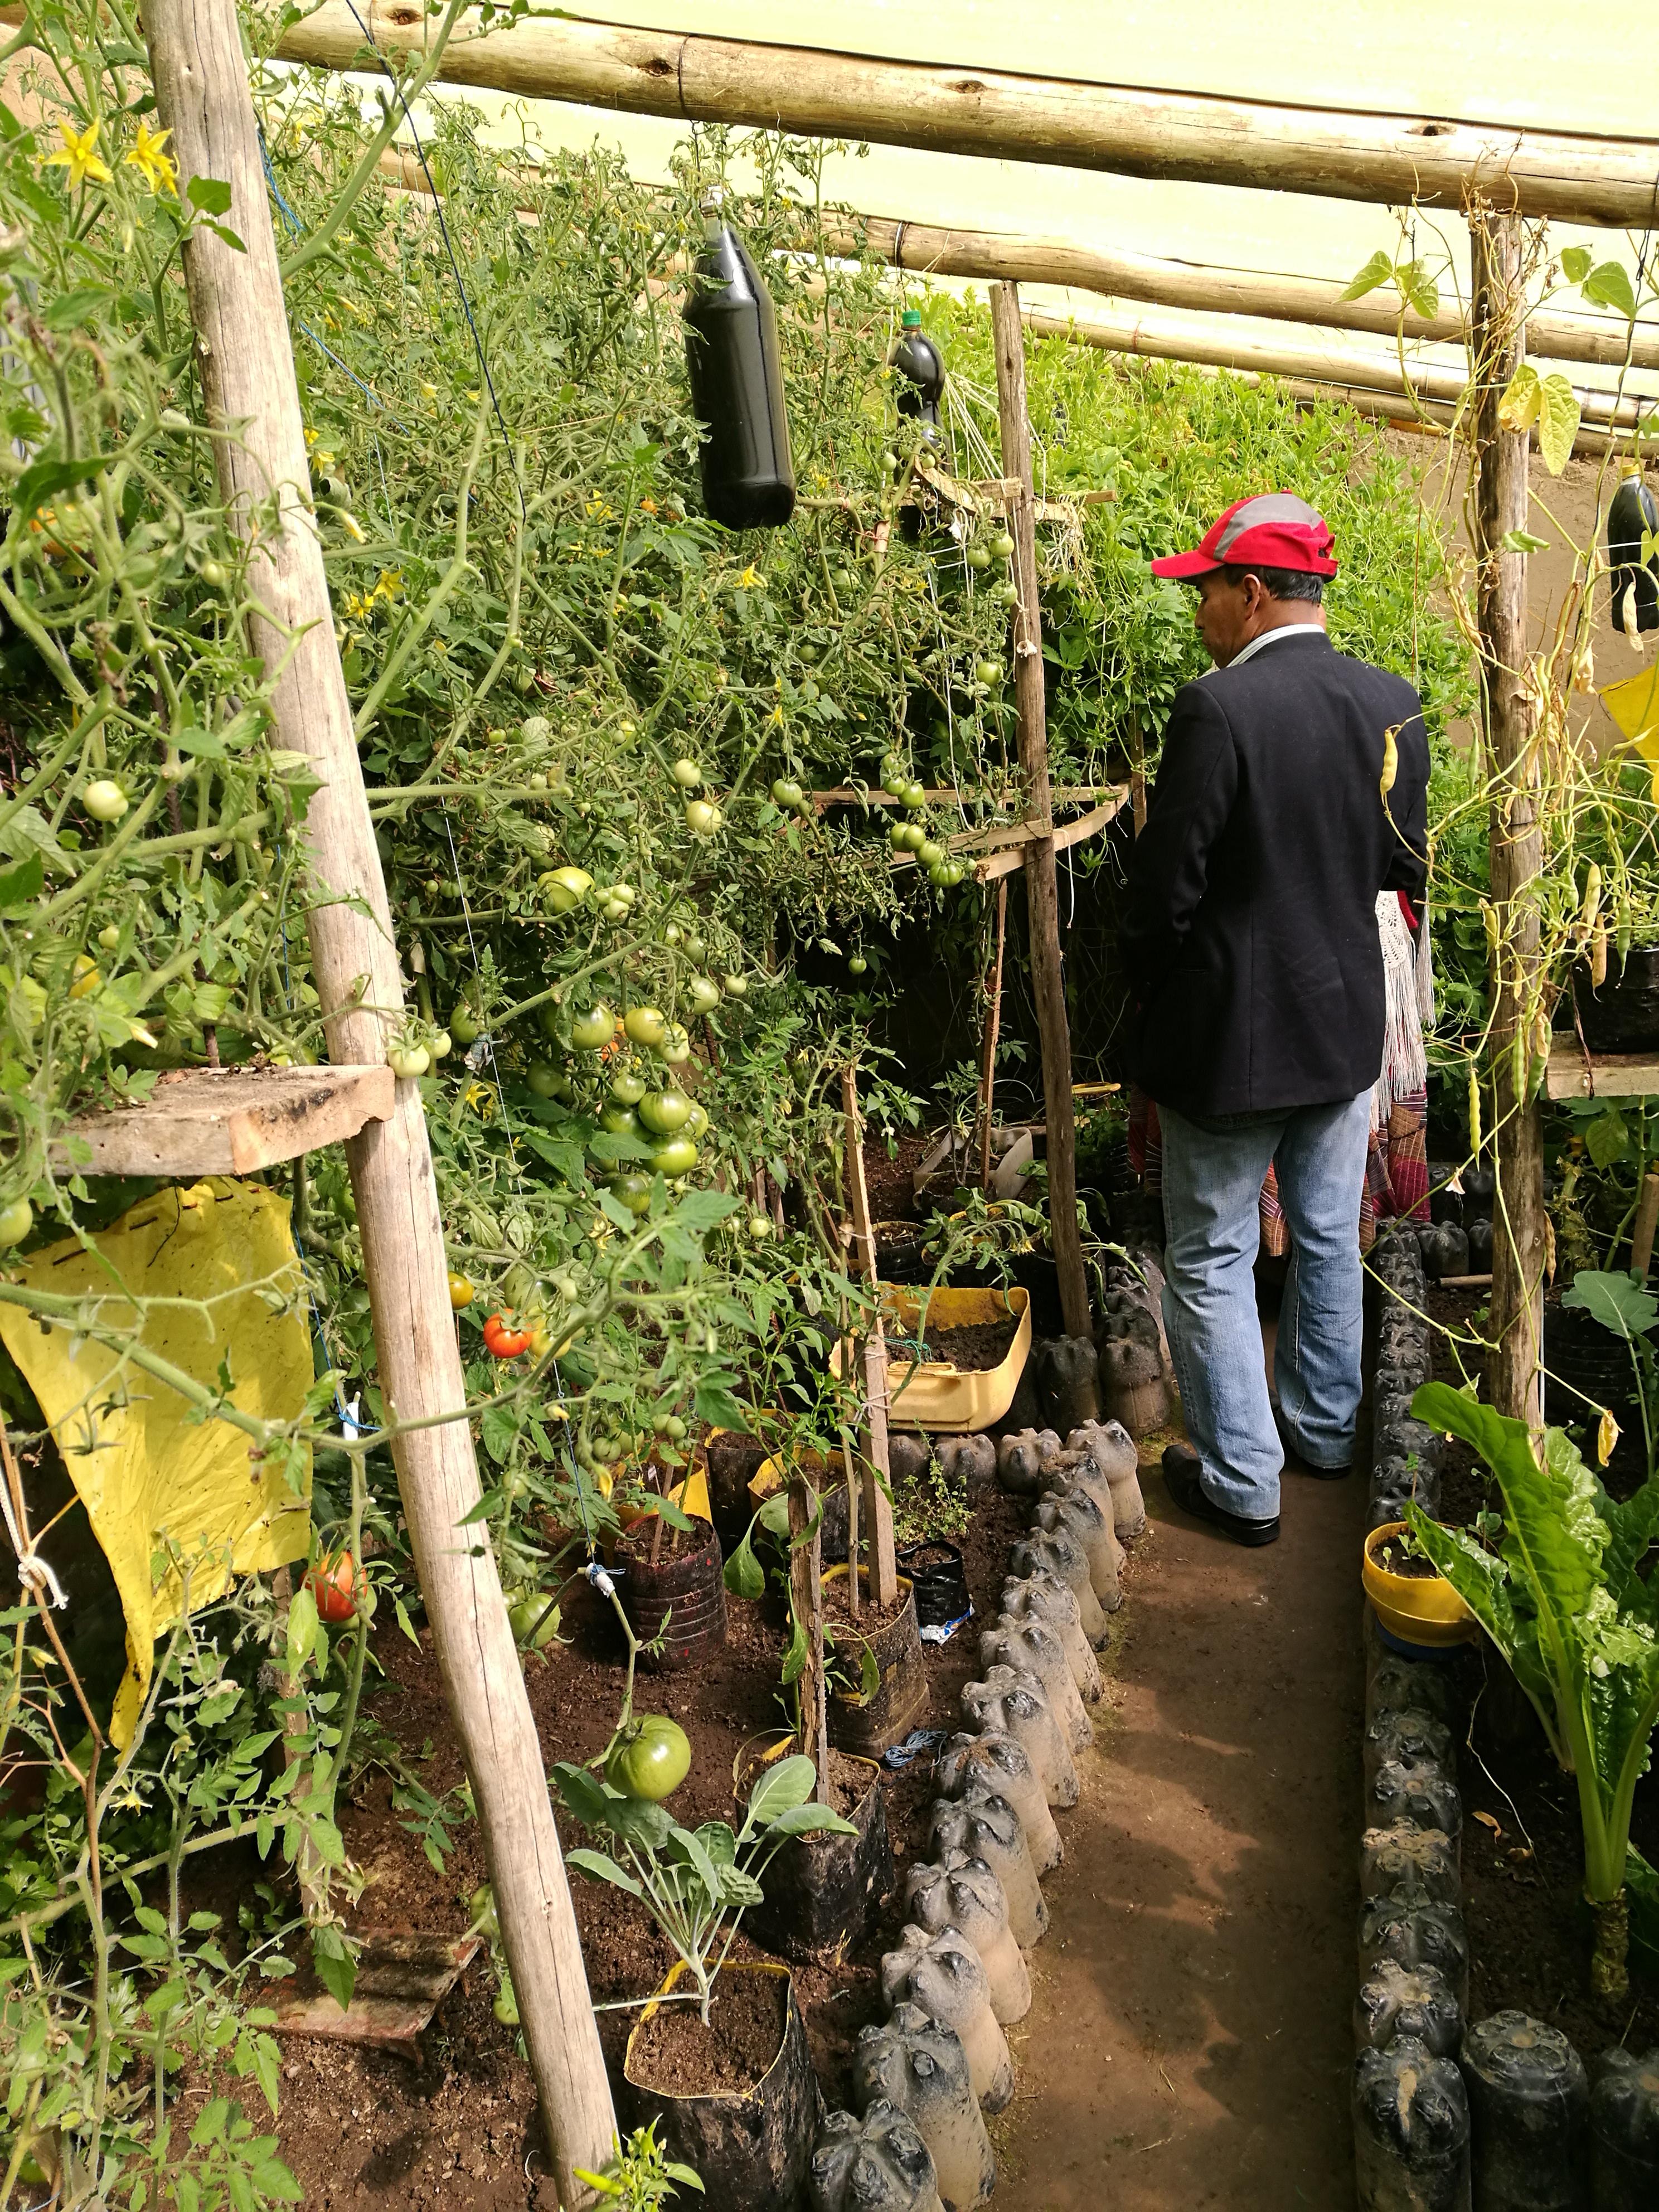 What life abundant looks like in a family greenhouse, El Alto, Bolivia.